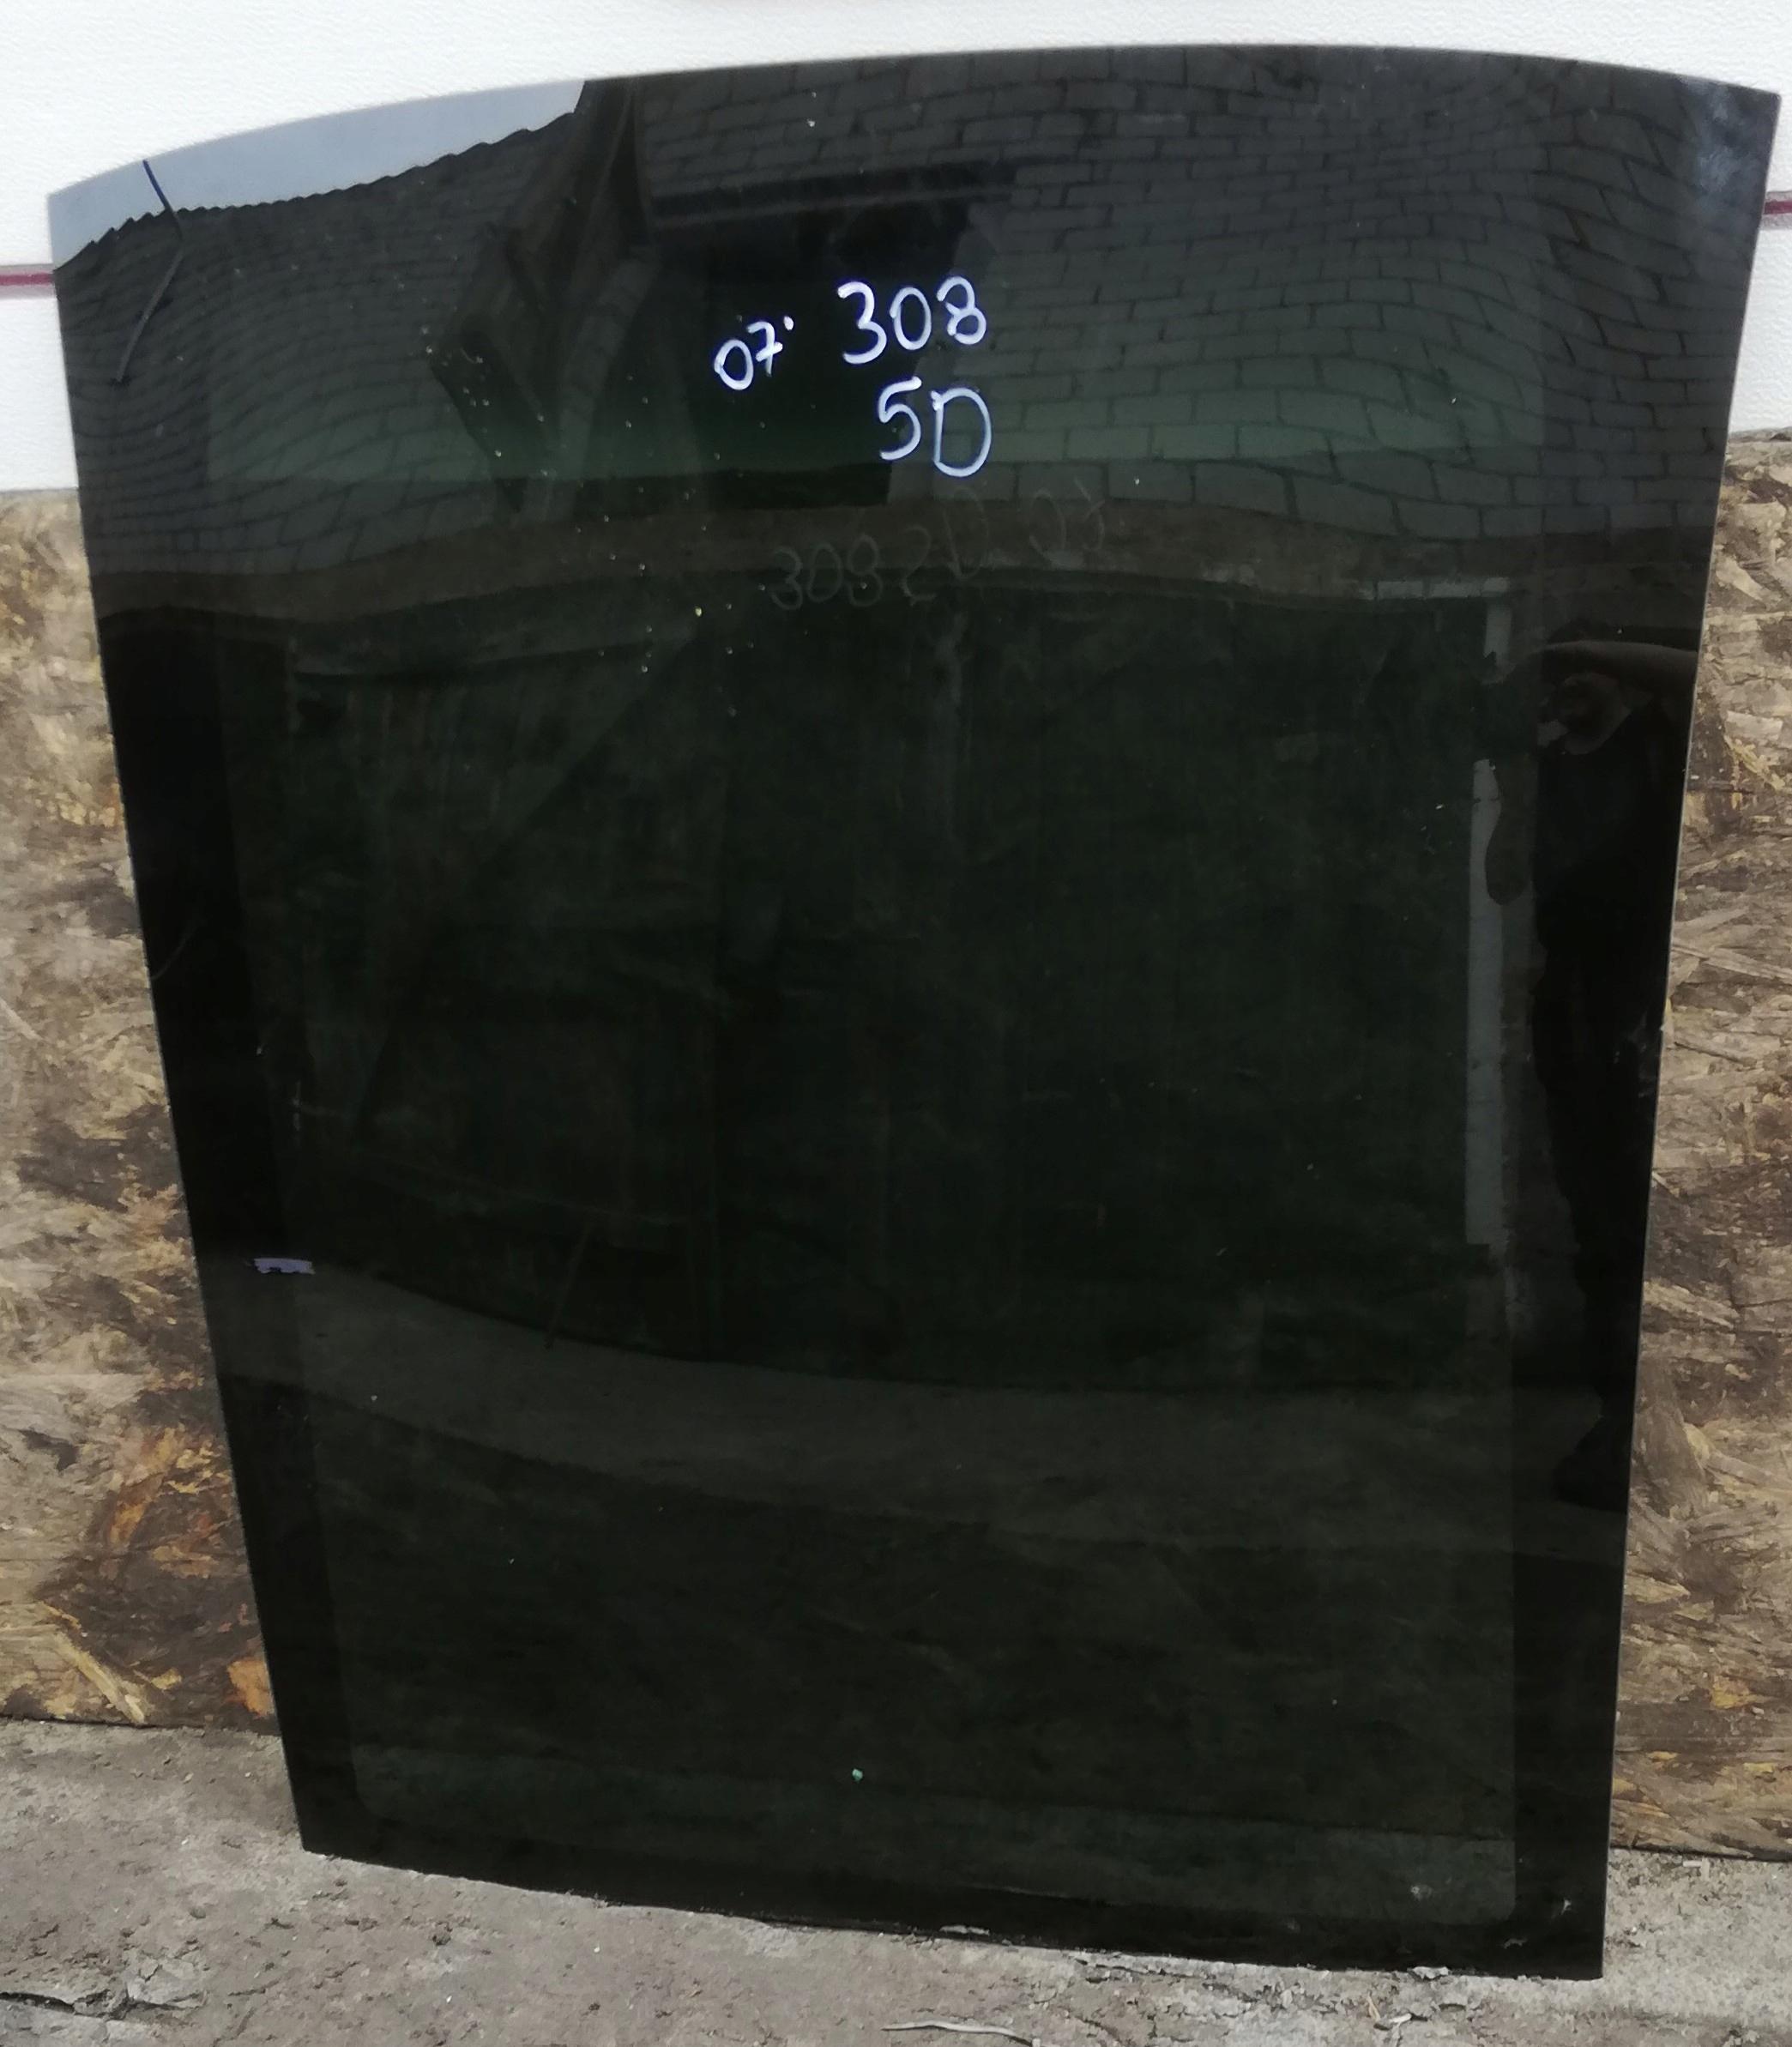 peugeot 308 стекло панорама крыша